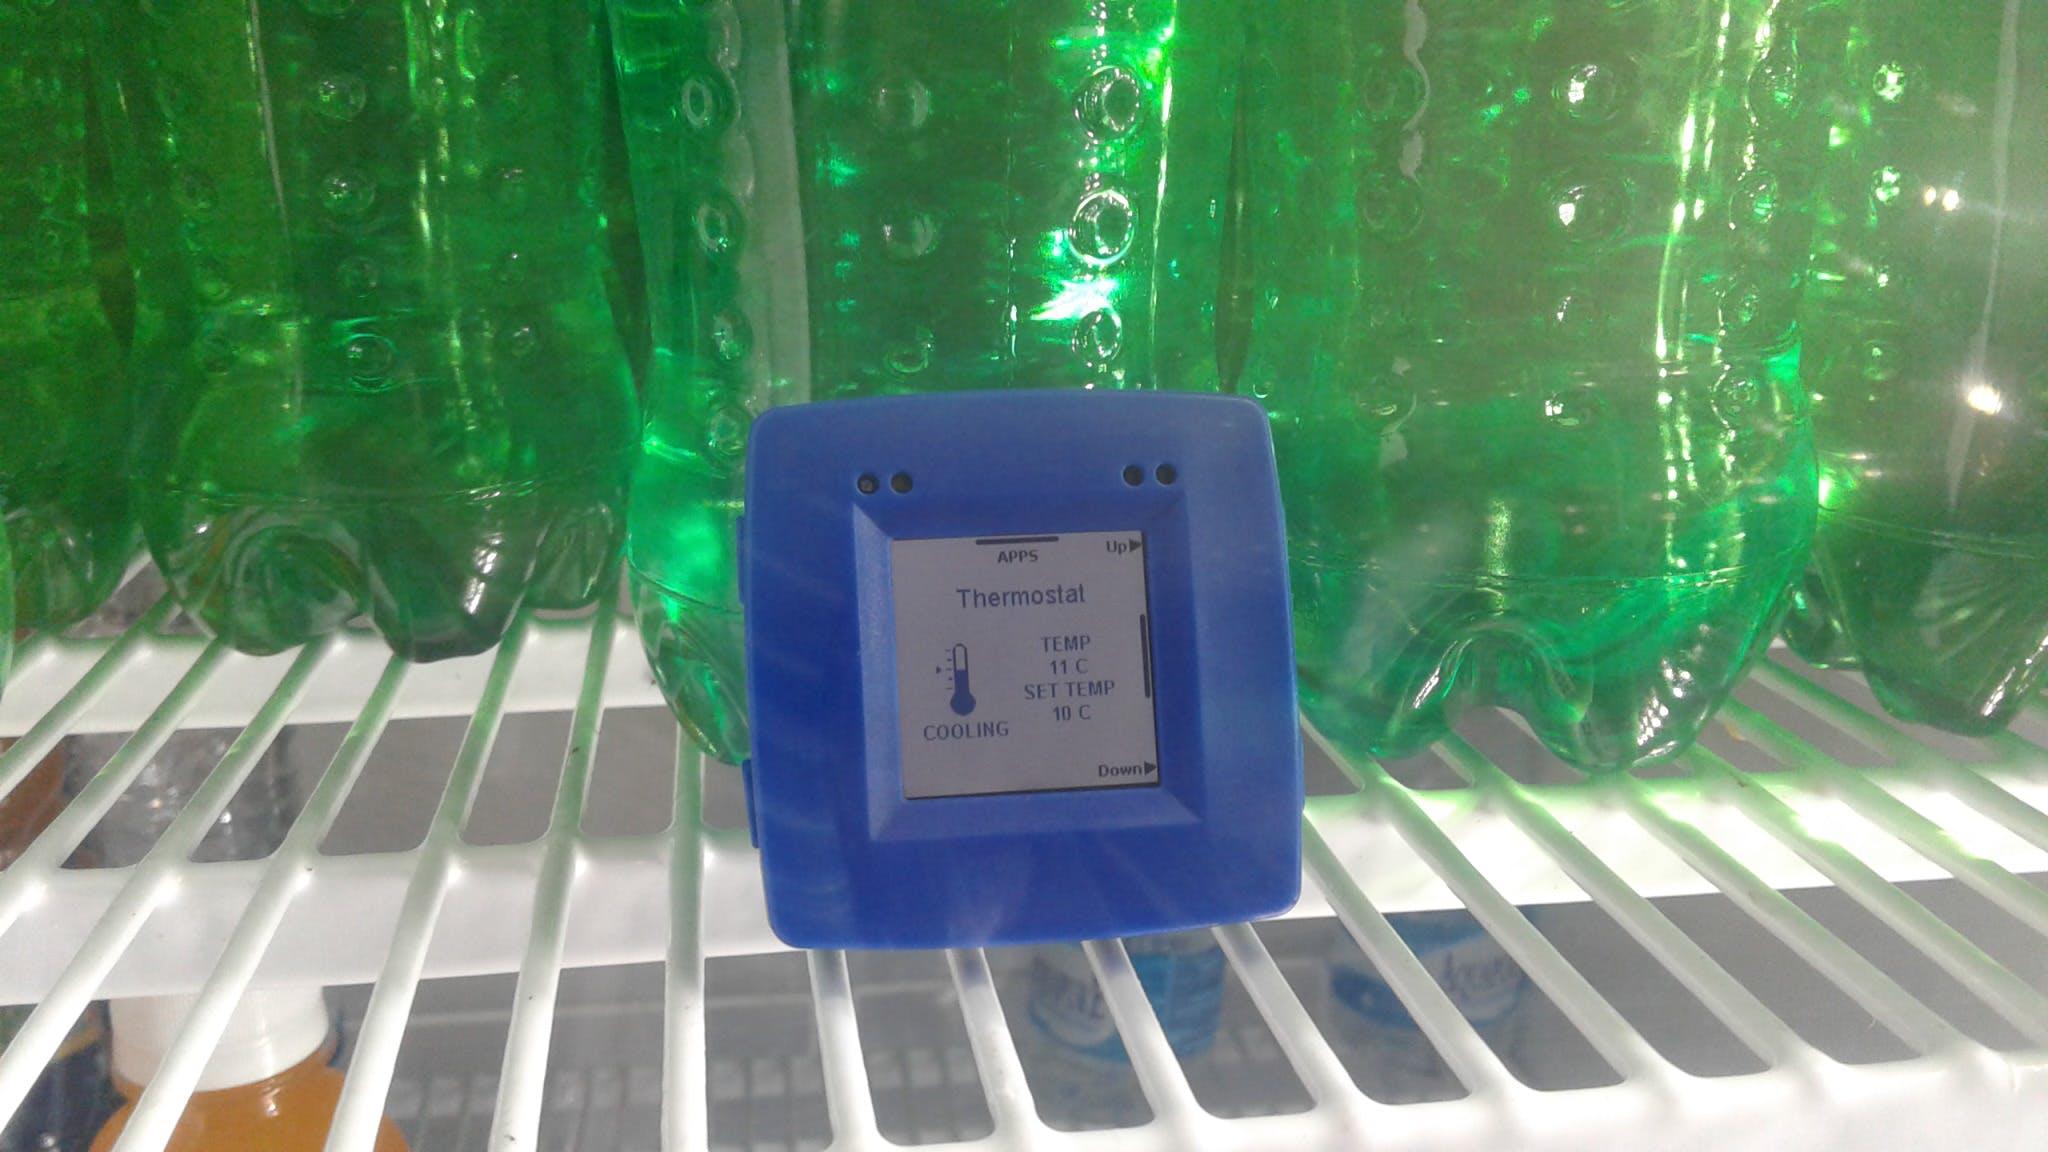 Temperature inside the refrigerator ware house